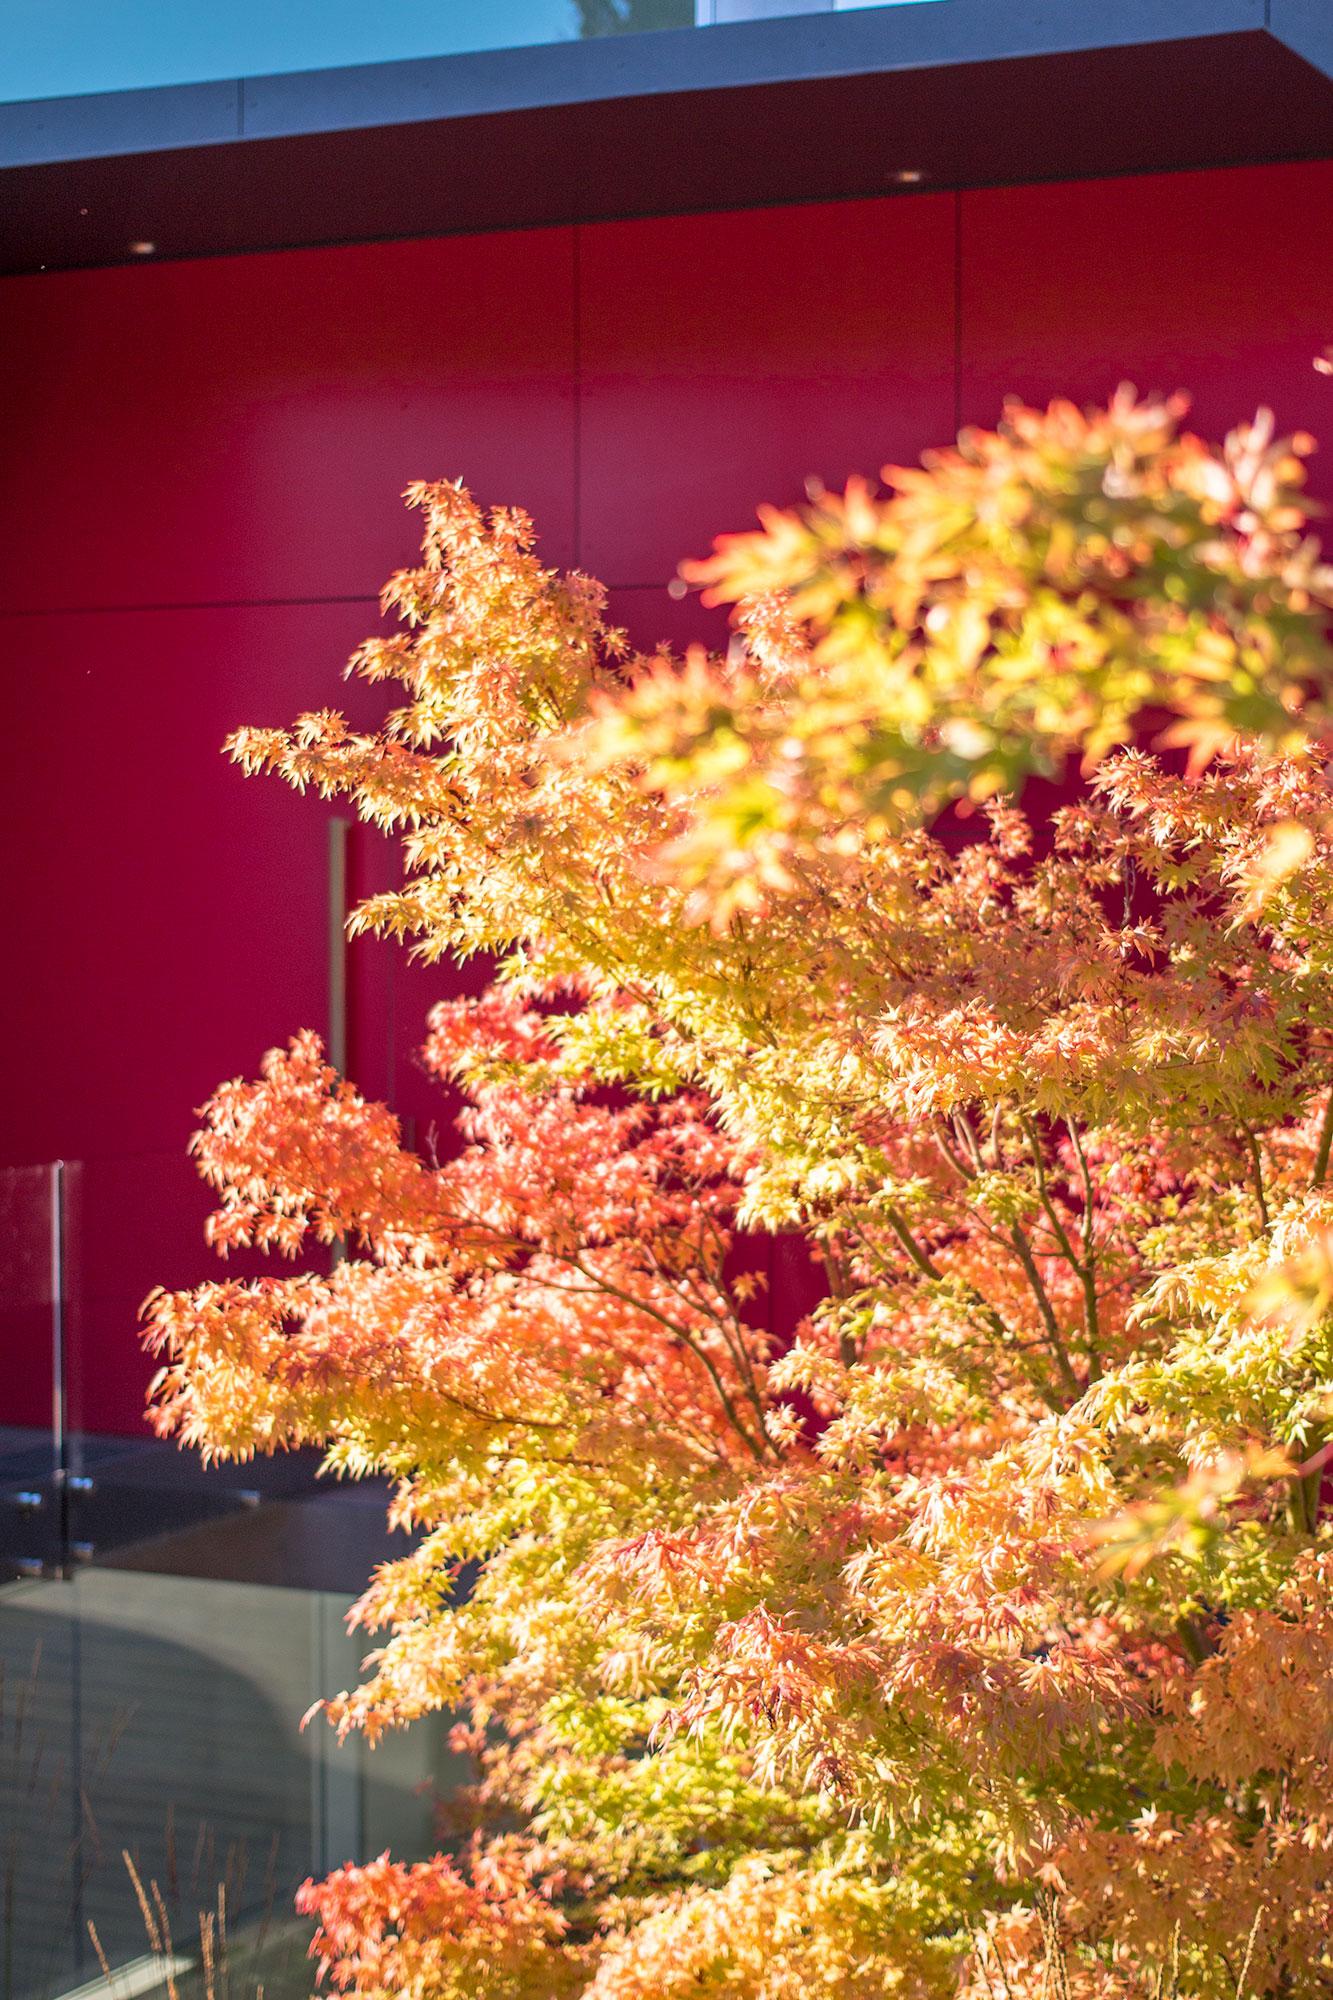 Botanica Design | Photo by: Hank White